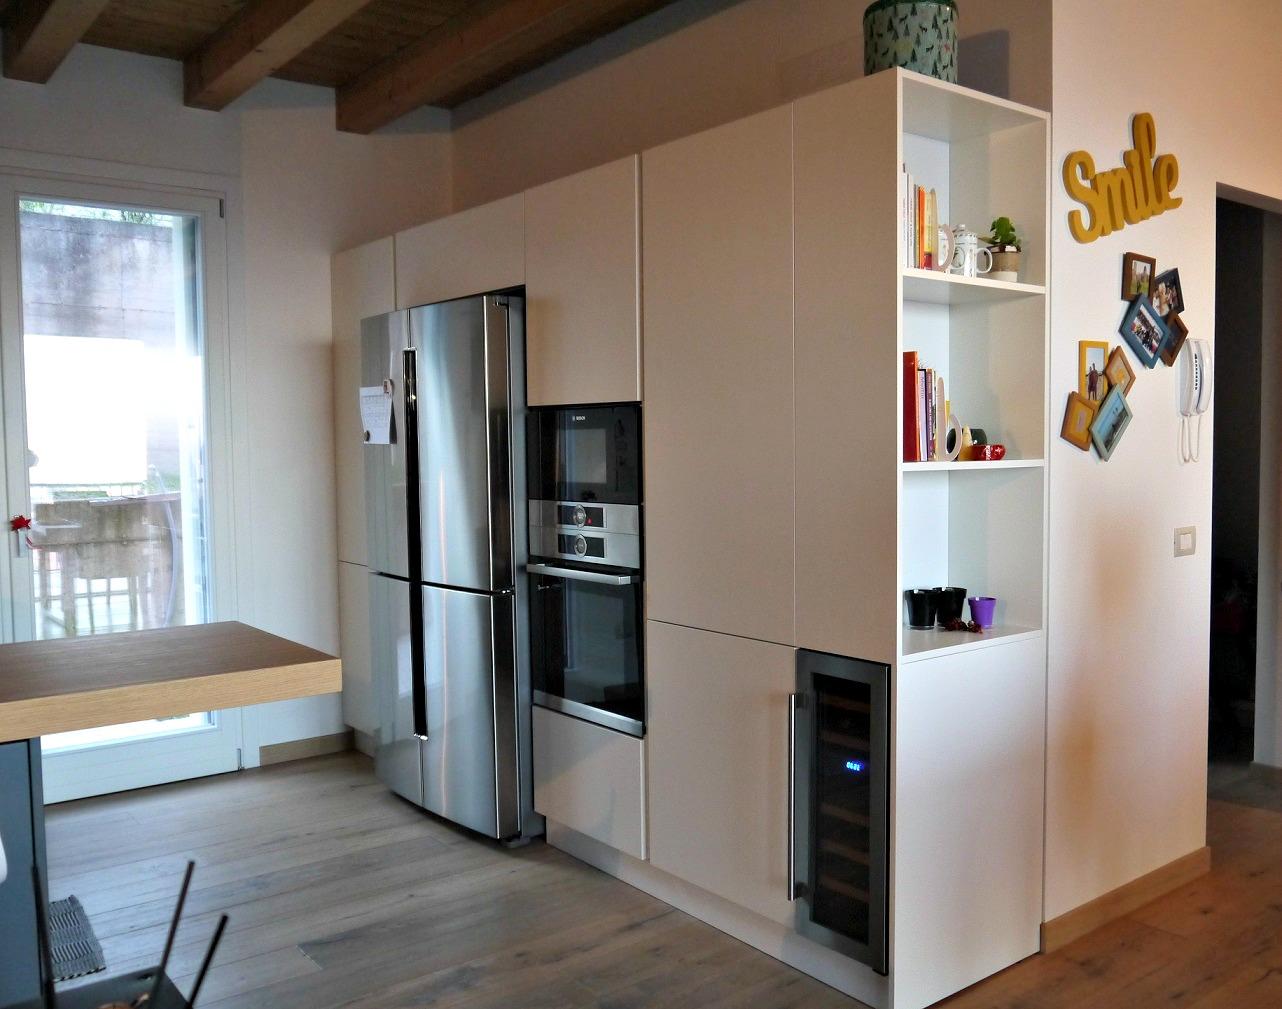 Cucina Moderna Con Frigo Americano | Biscottini Credenza Cucina Con ...